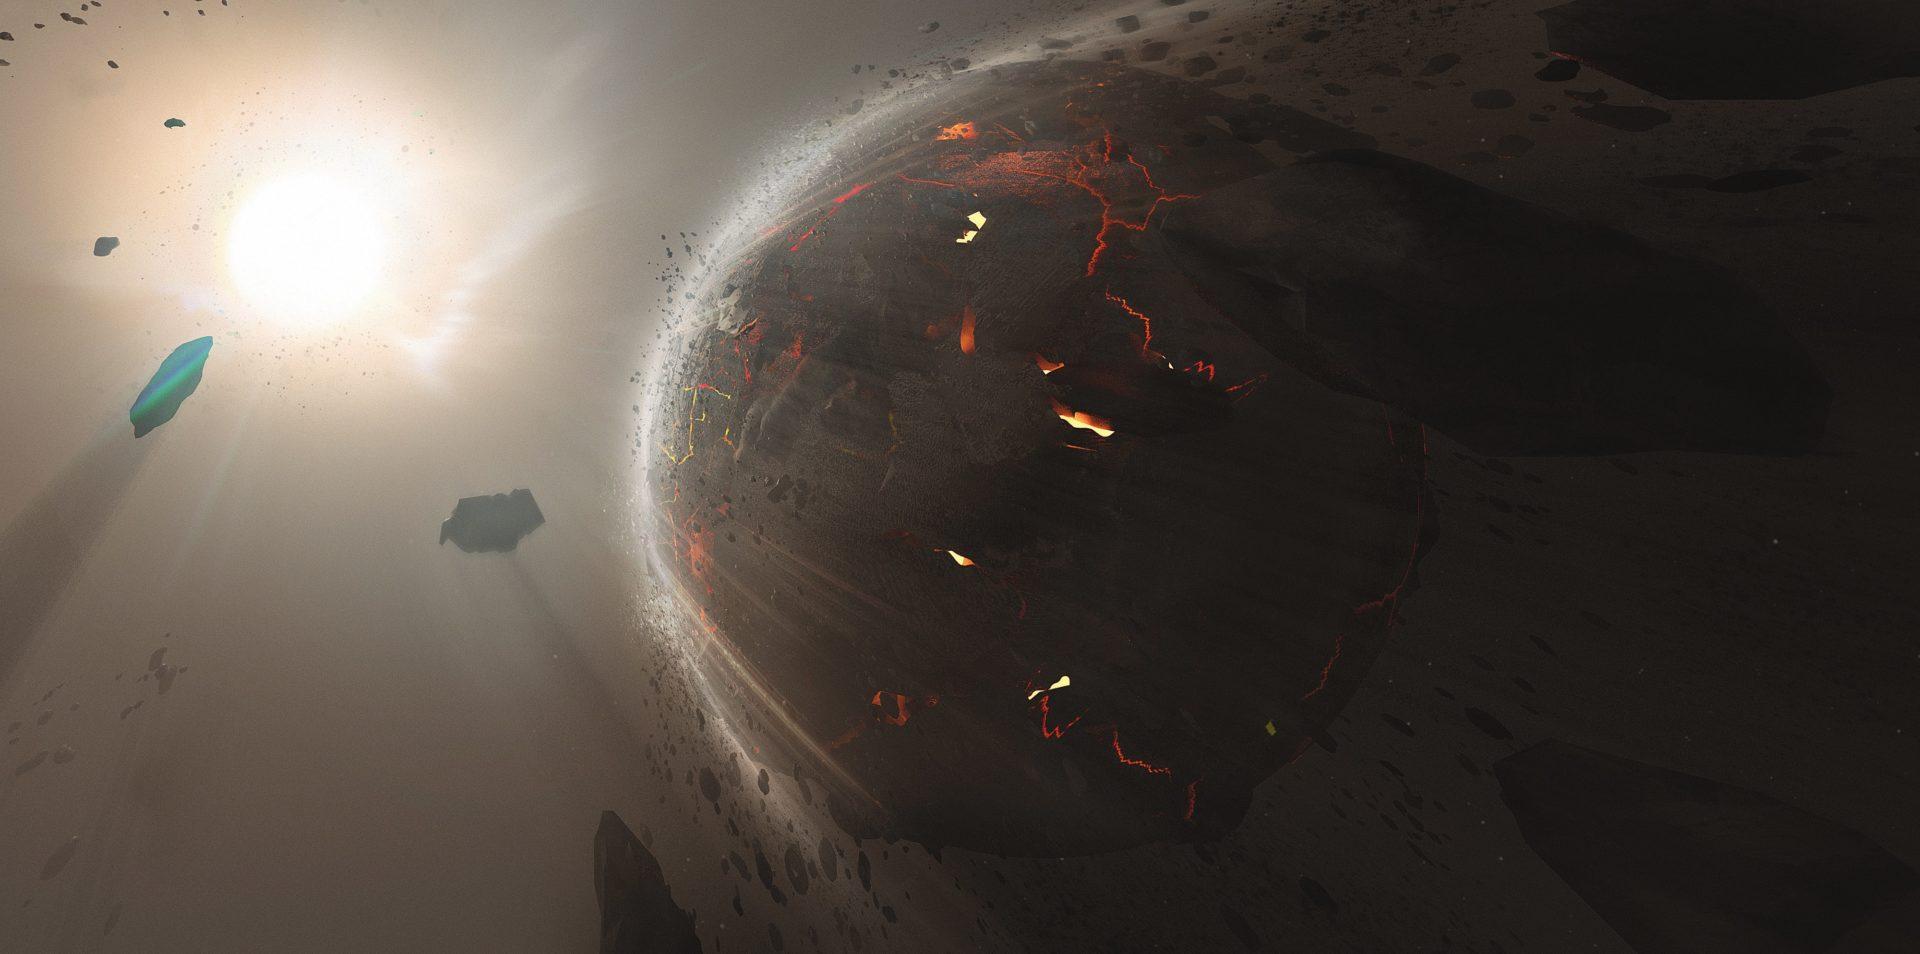 Charon_image_full-1920x954.jpg